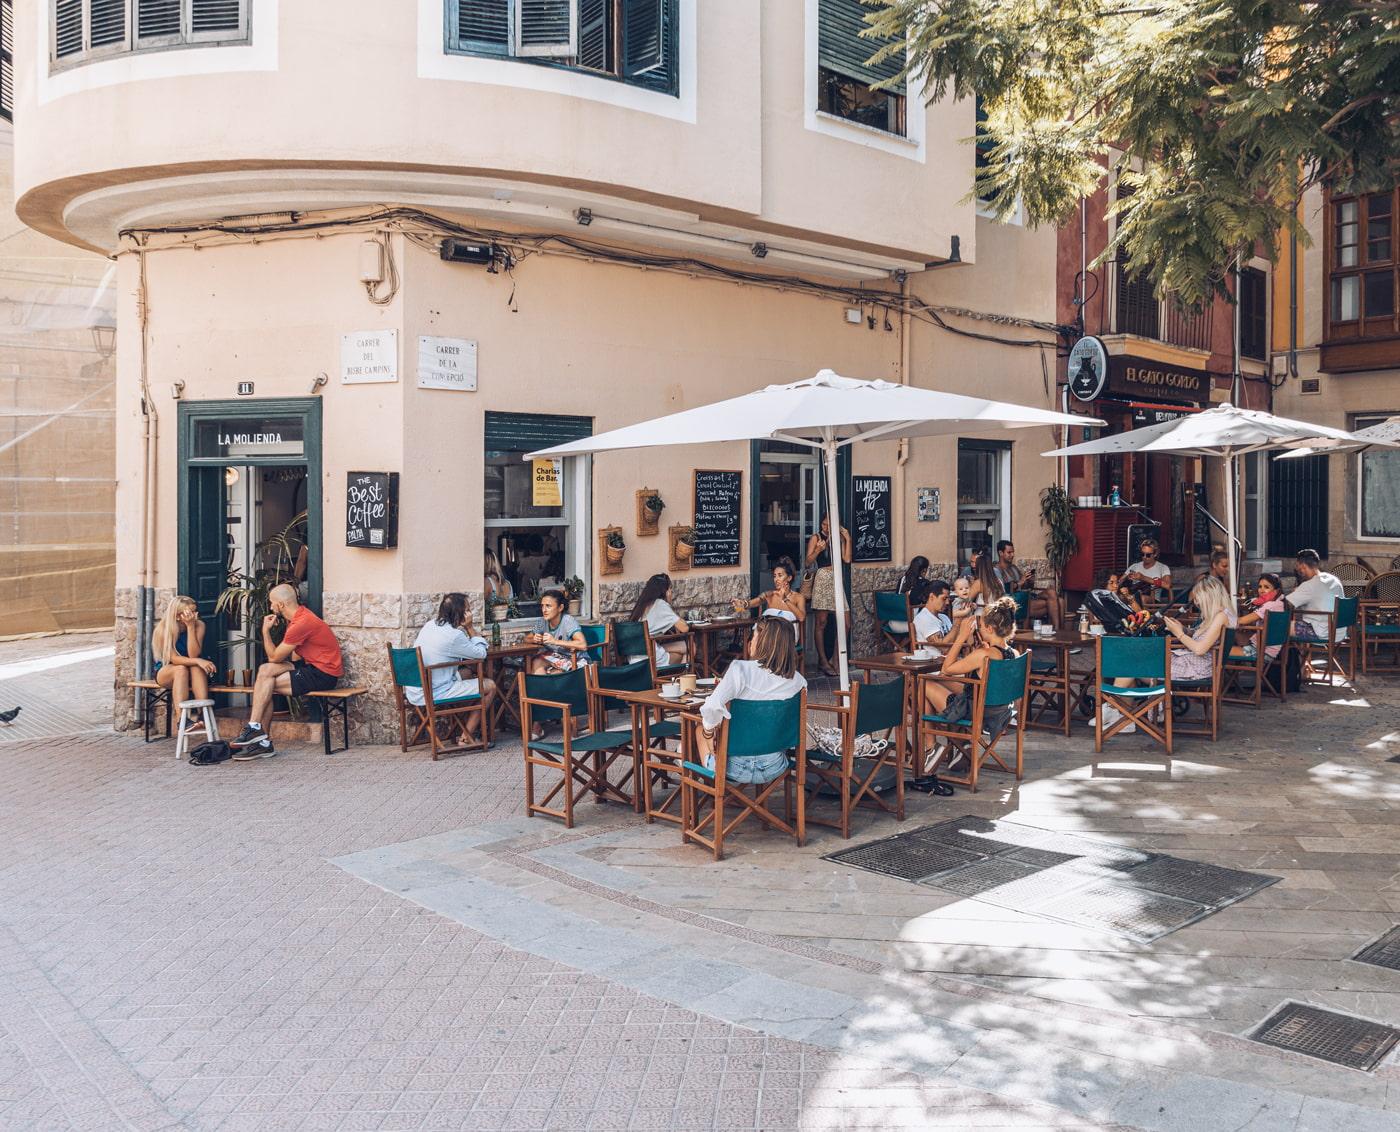 La Molienda corner cafe